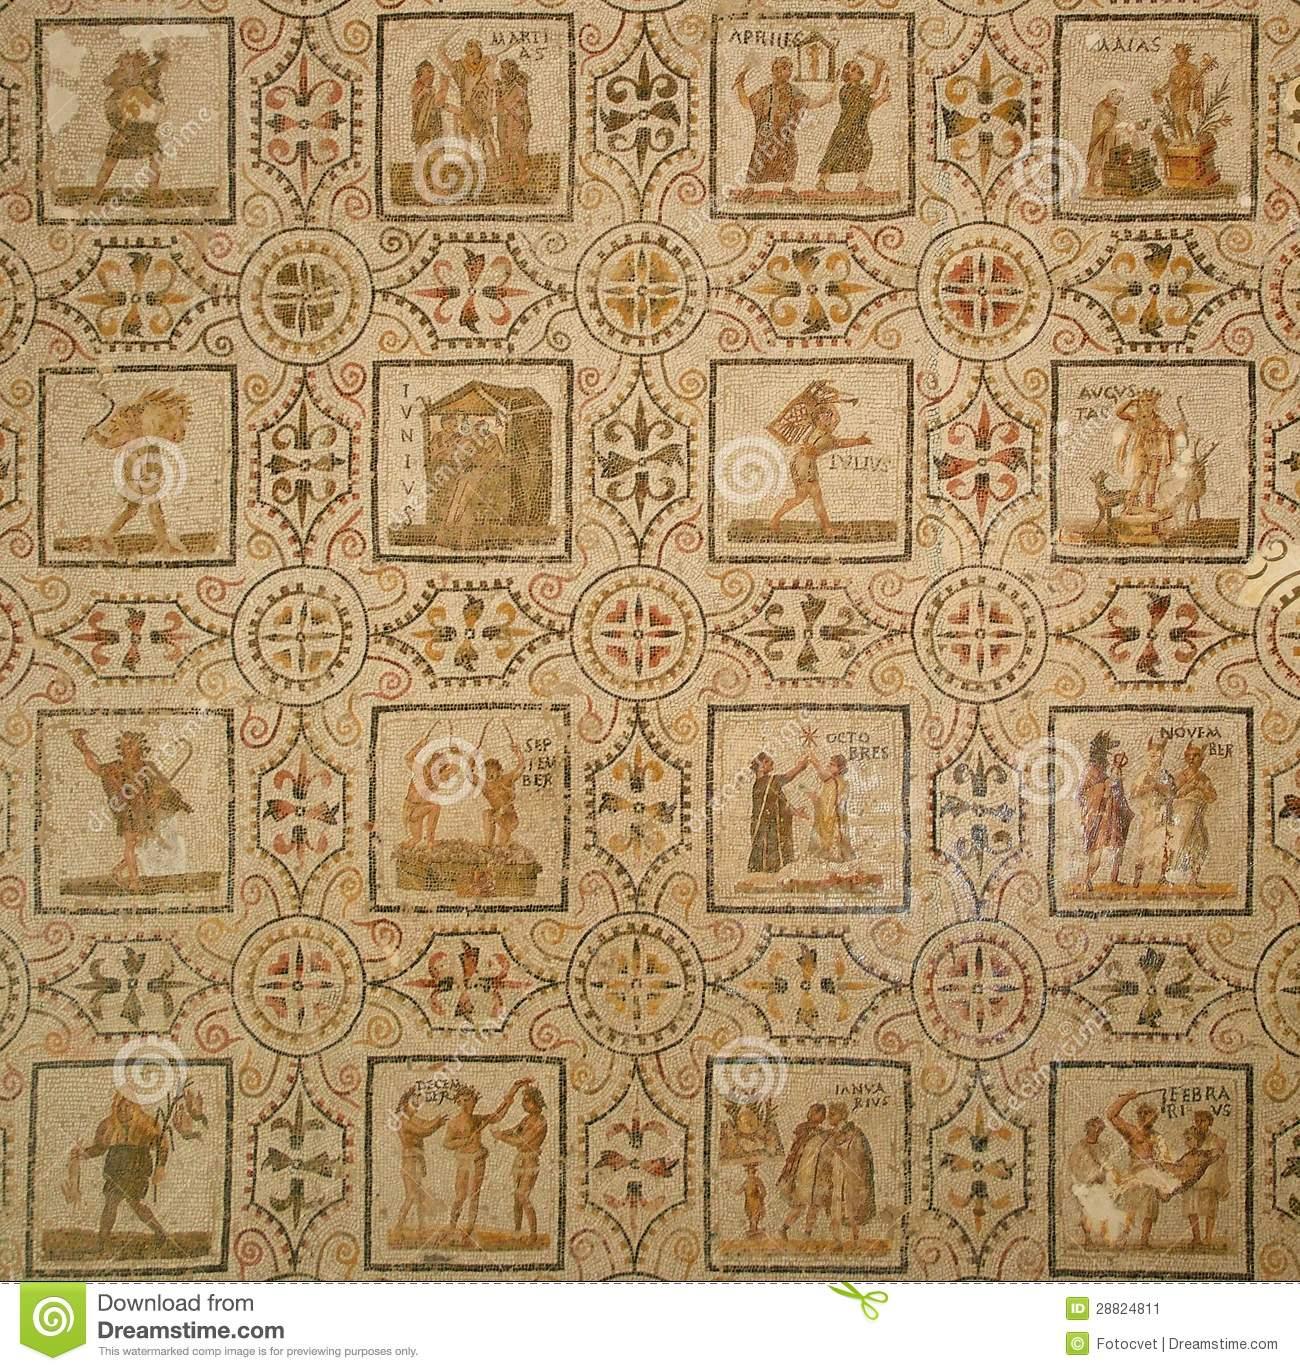 Il Calendario Romano.Un Mese Del Calendario Romano Ikbenalles